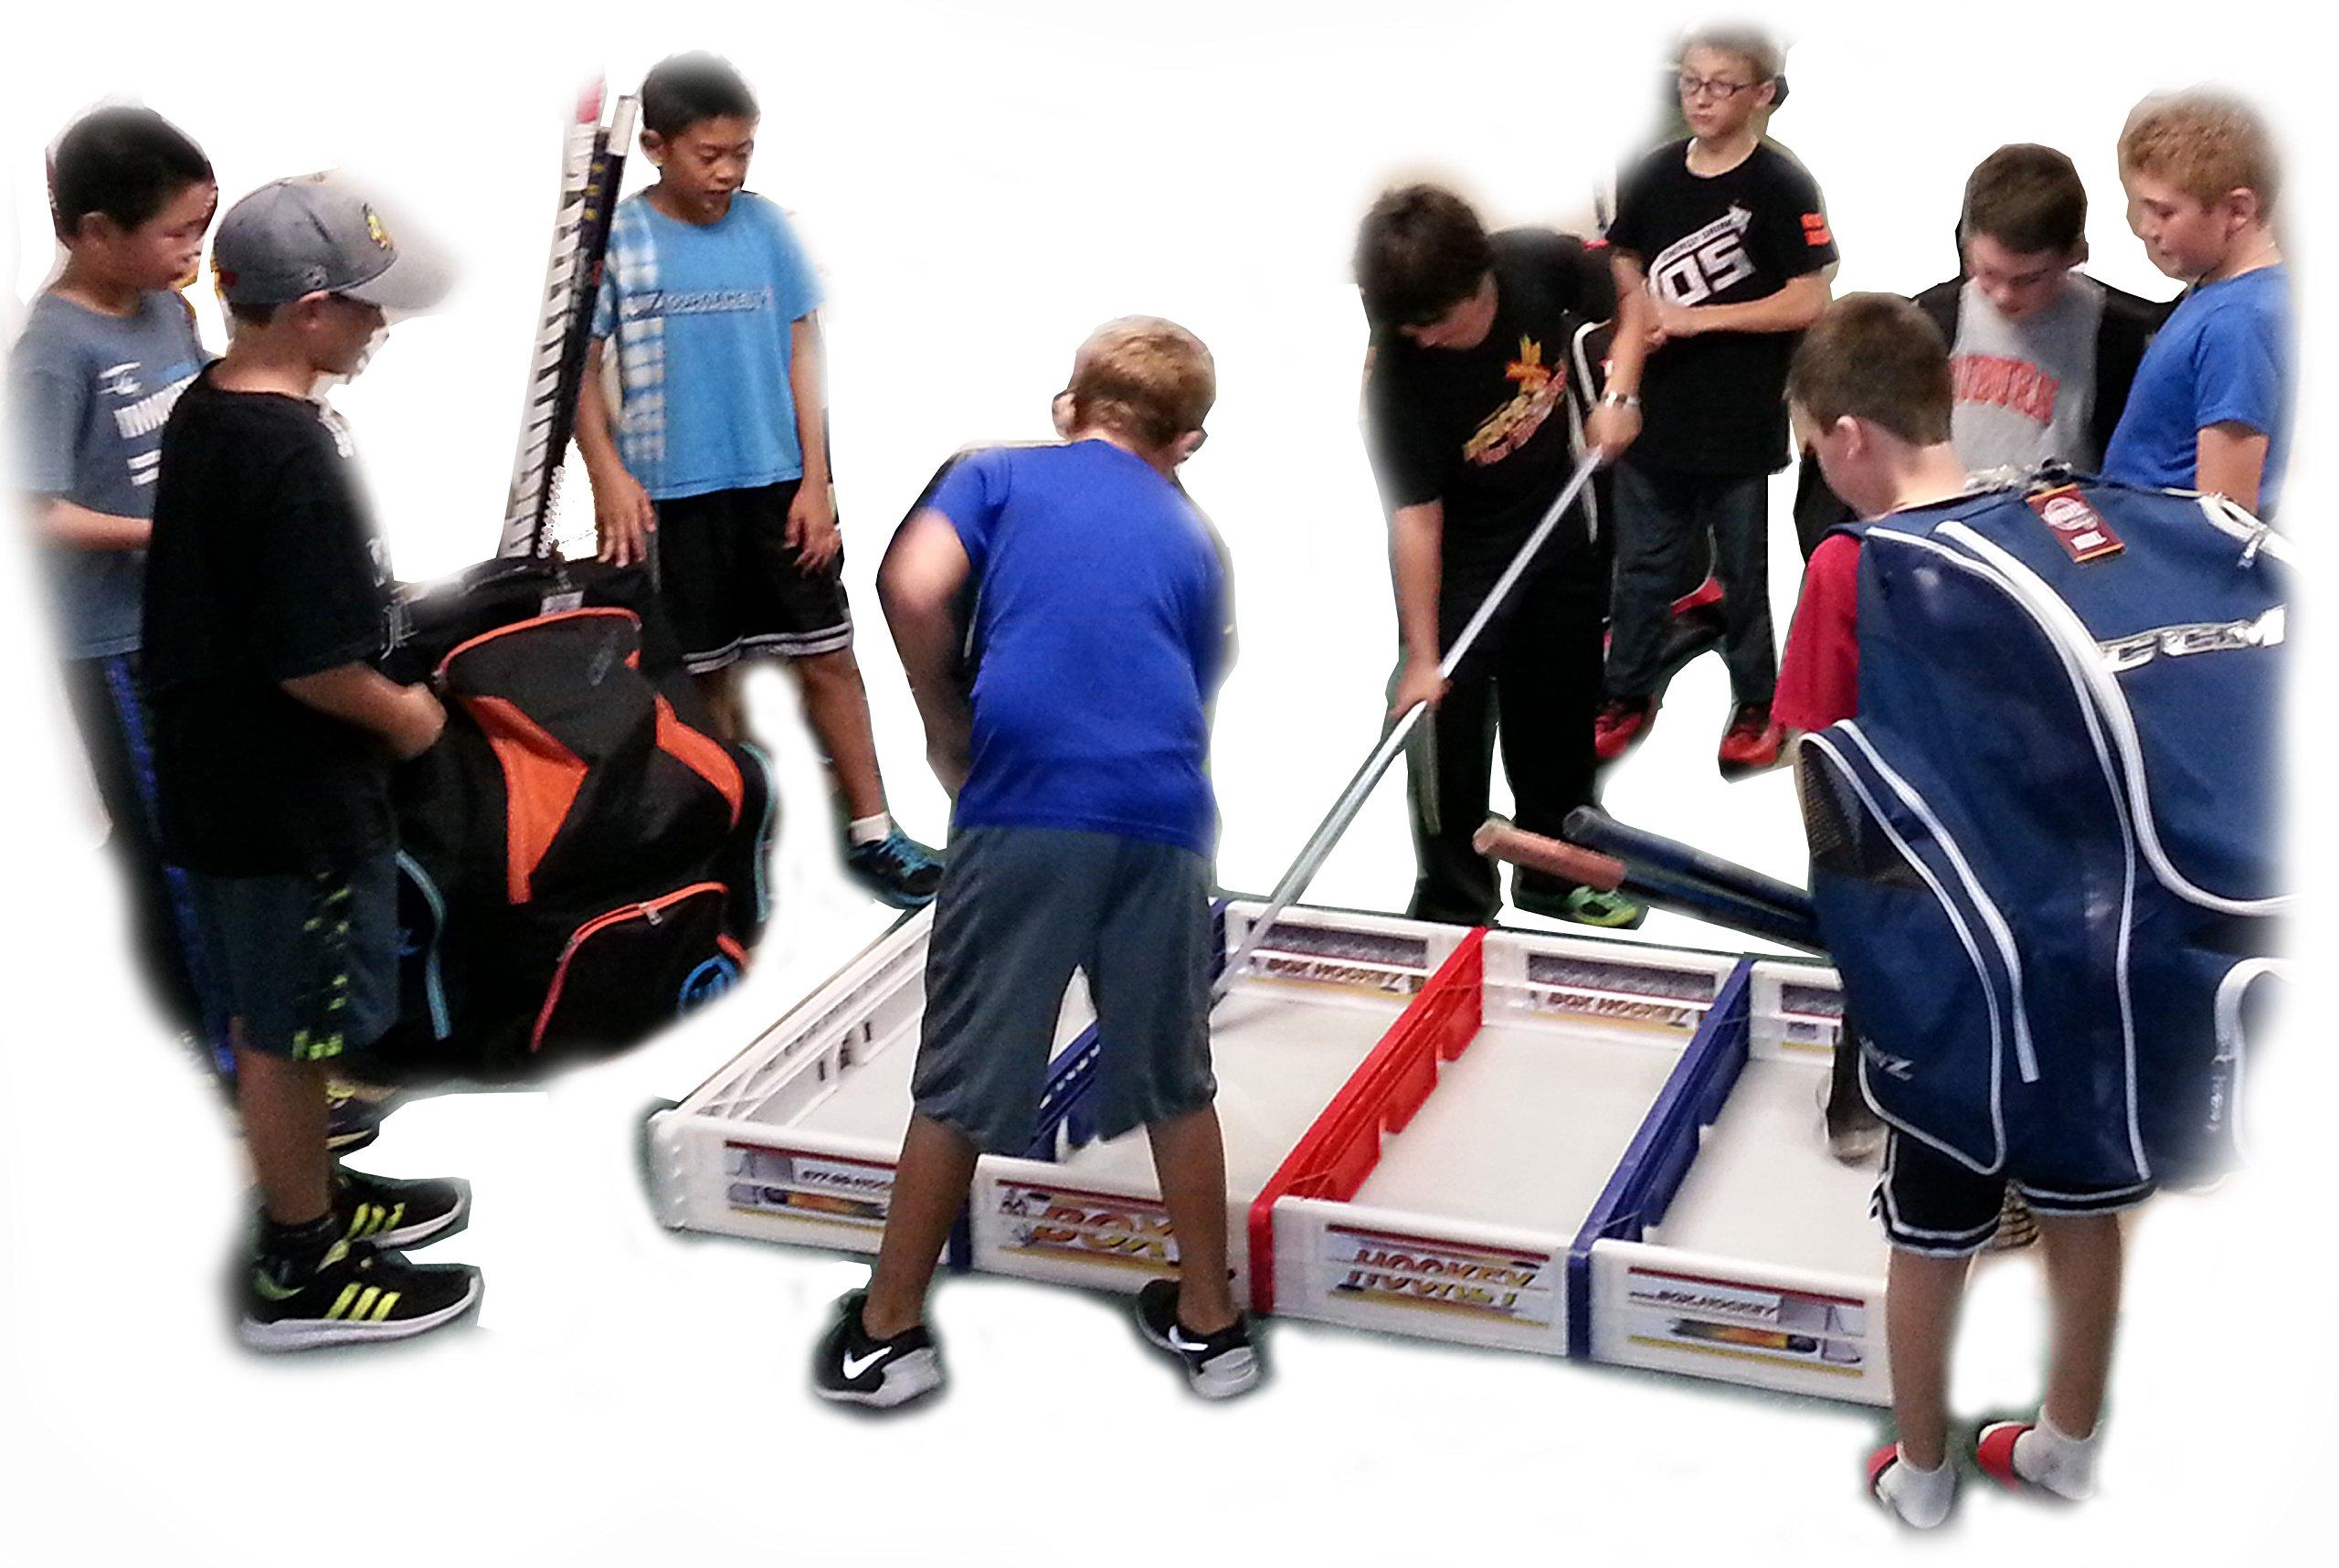 box hockey _ boxhockey _ box hockey game _ #boxhockey by Box Hockey Intl. Inc